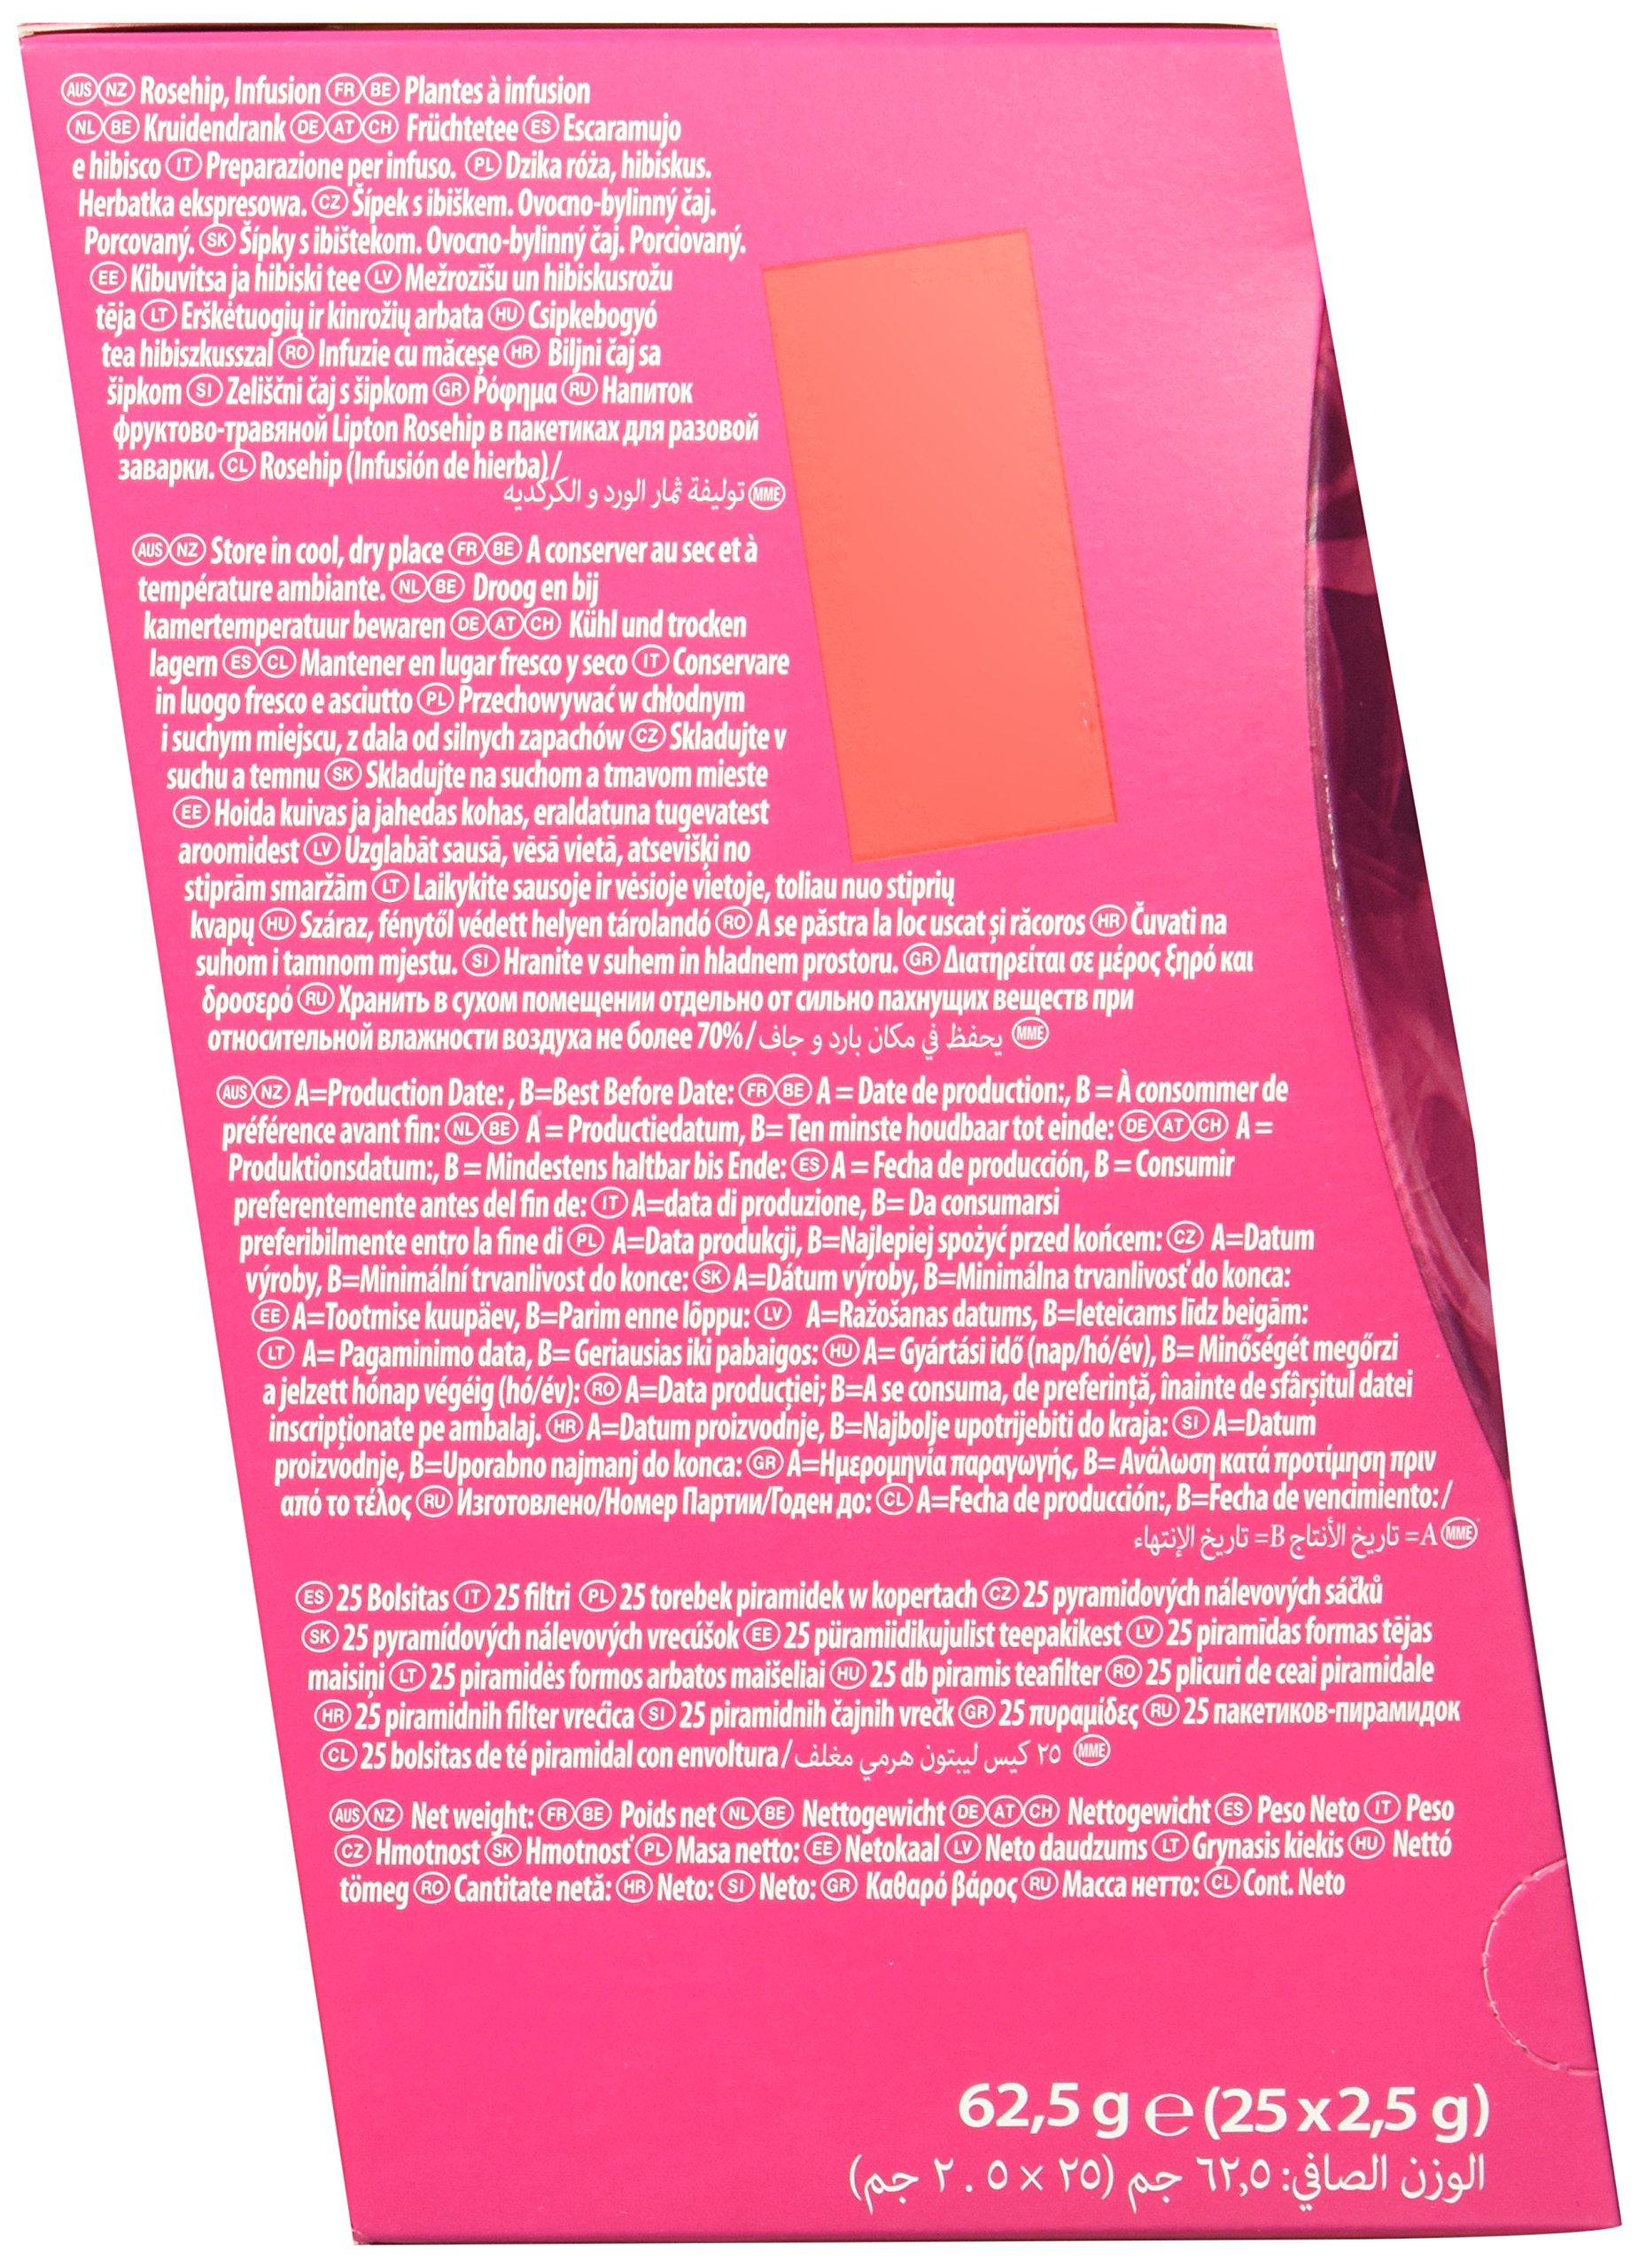 Lipton-Hagebutten-Infusion-Pyramidbeutel-625-g